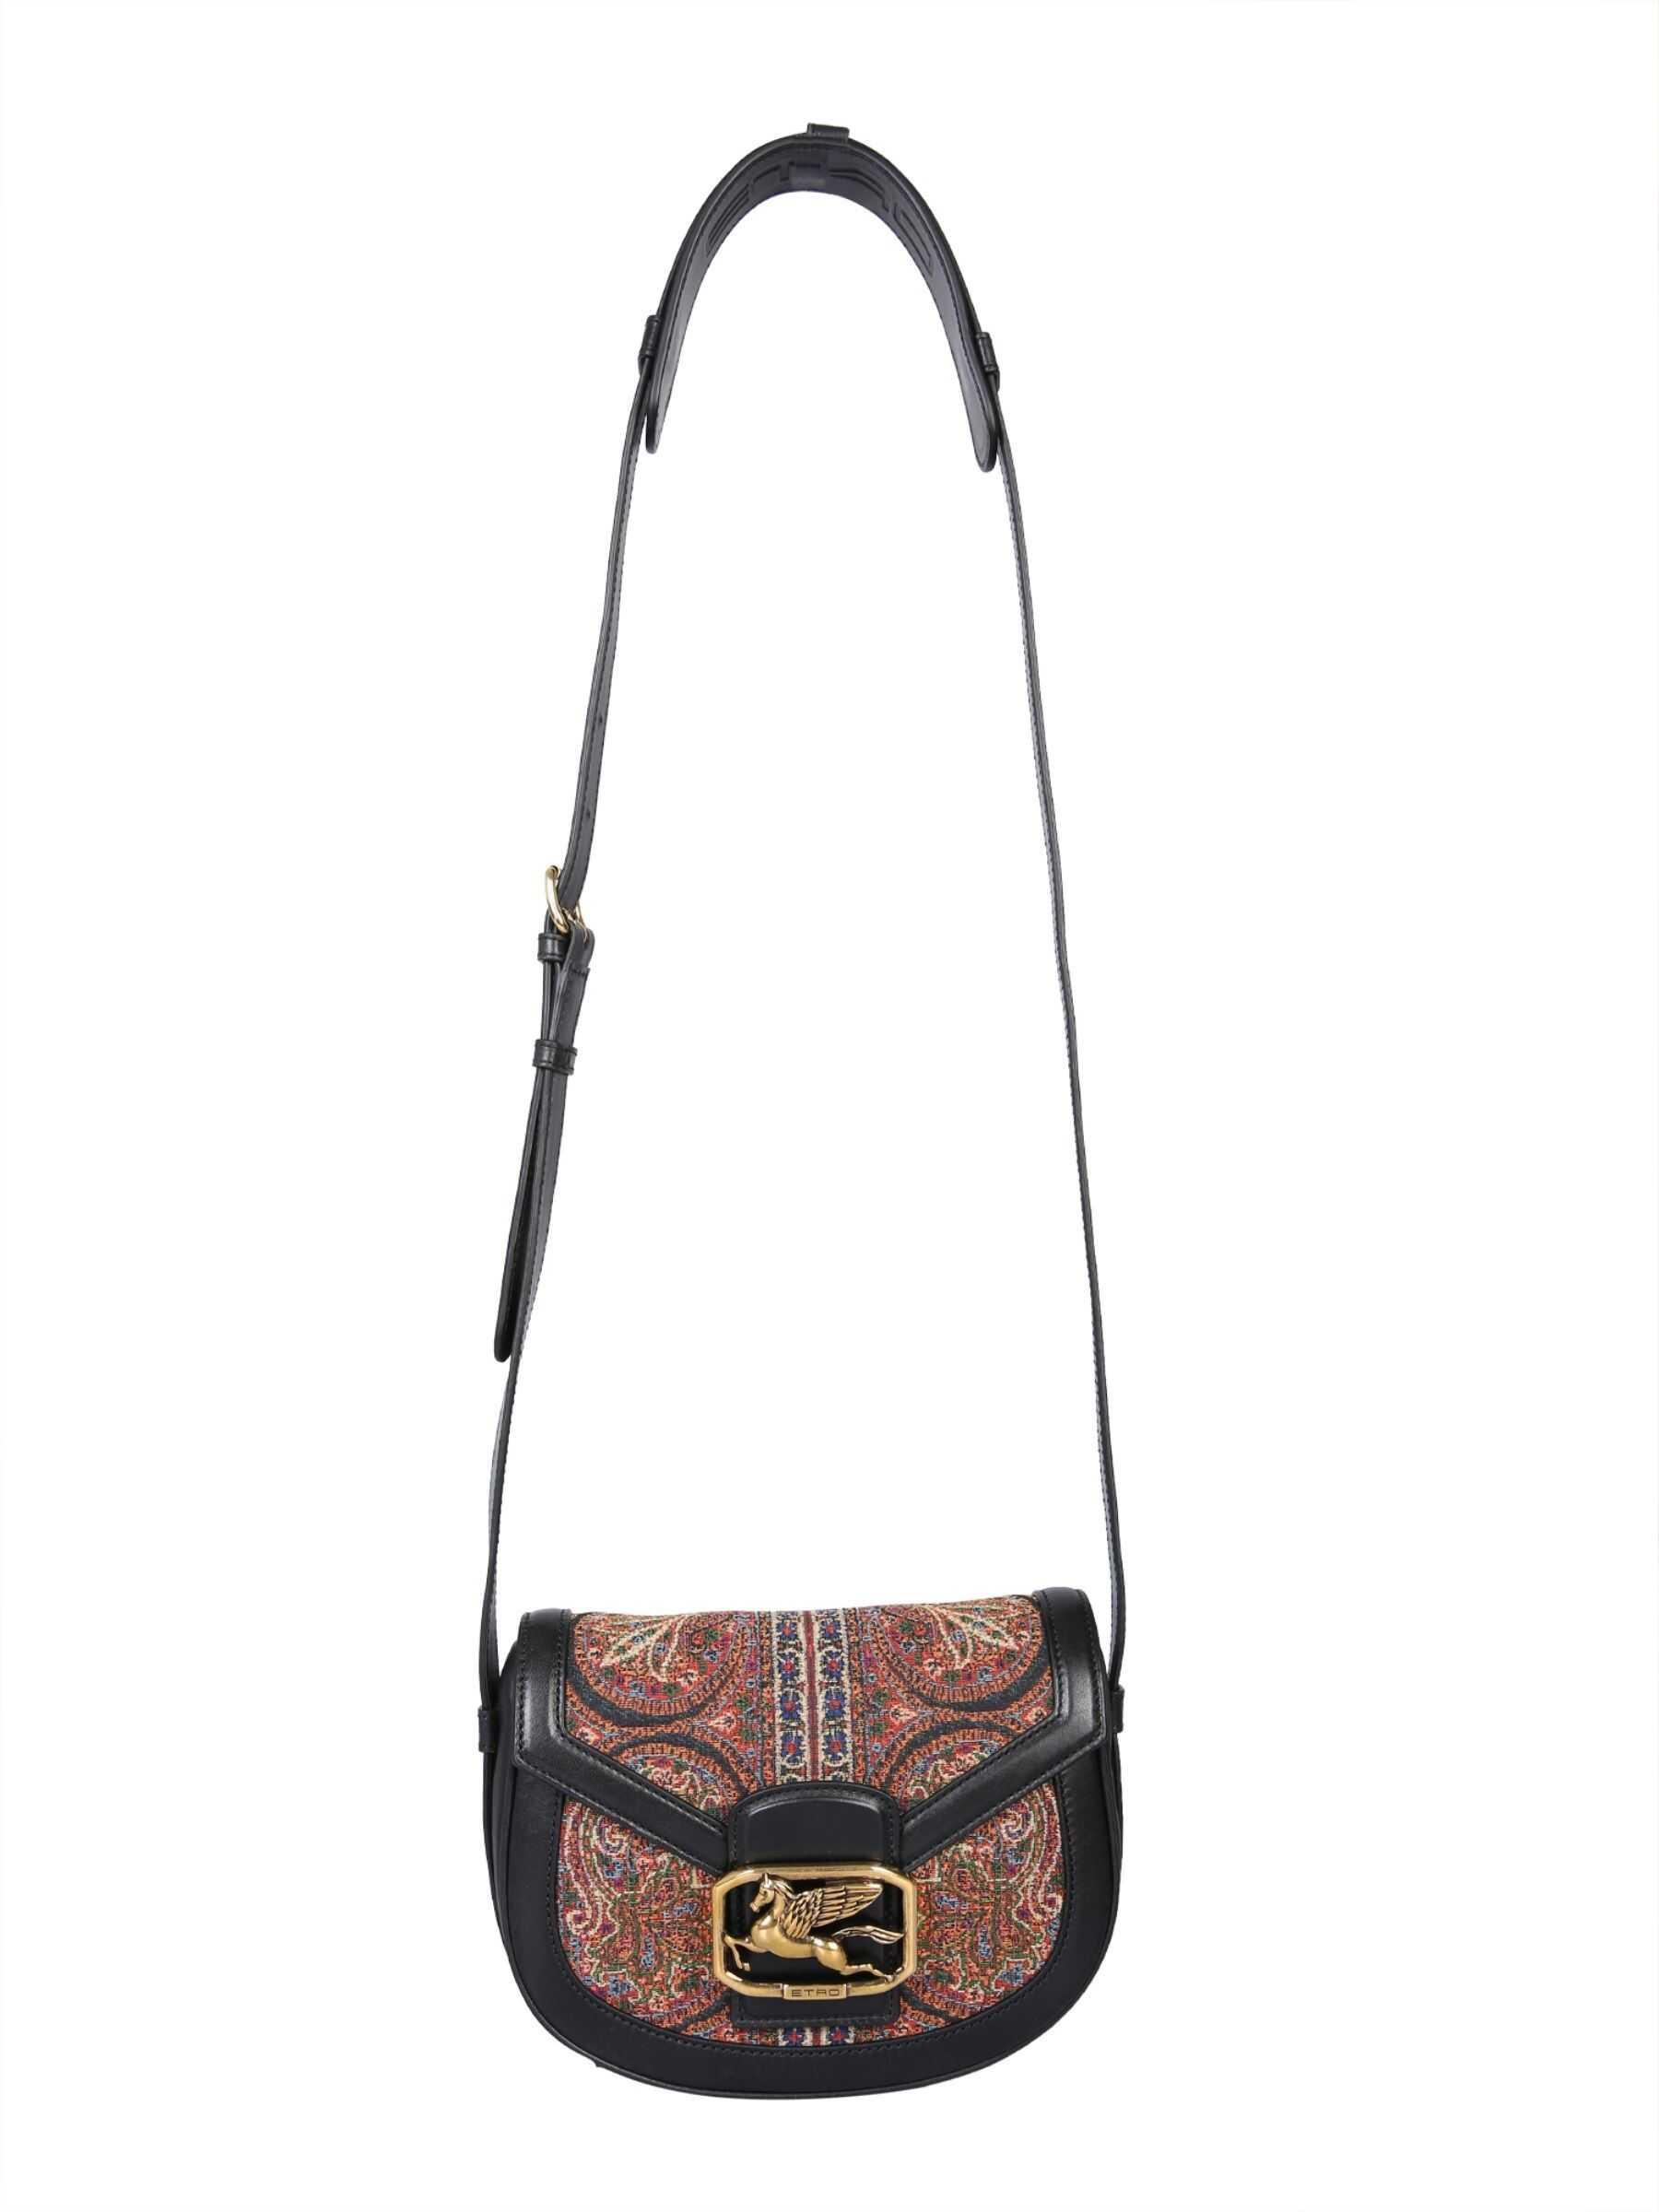 ETRO Pegaso Shoulder Bag 1I352_58488000 MULTICOLOUR imagine b-mall.ro